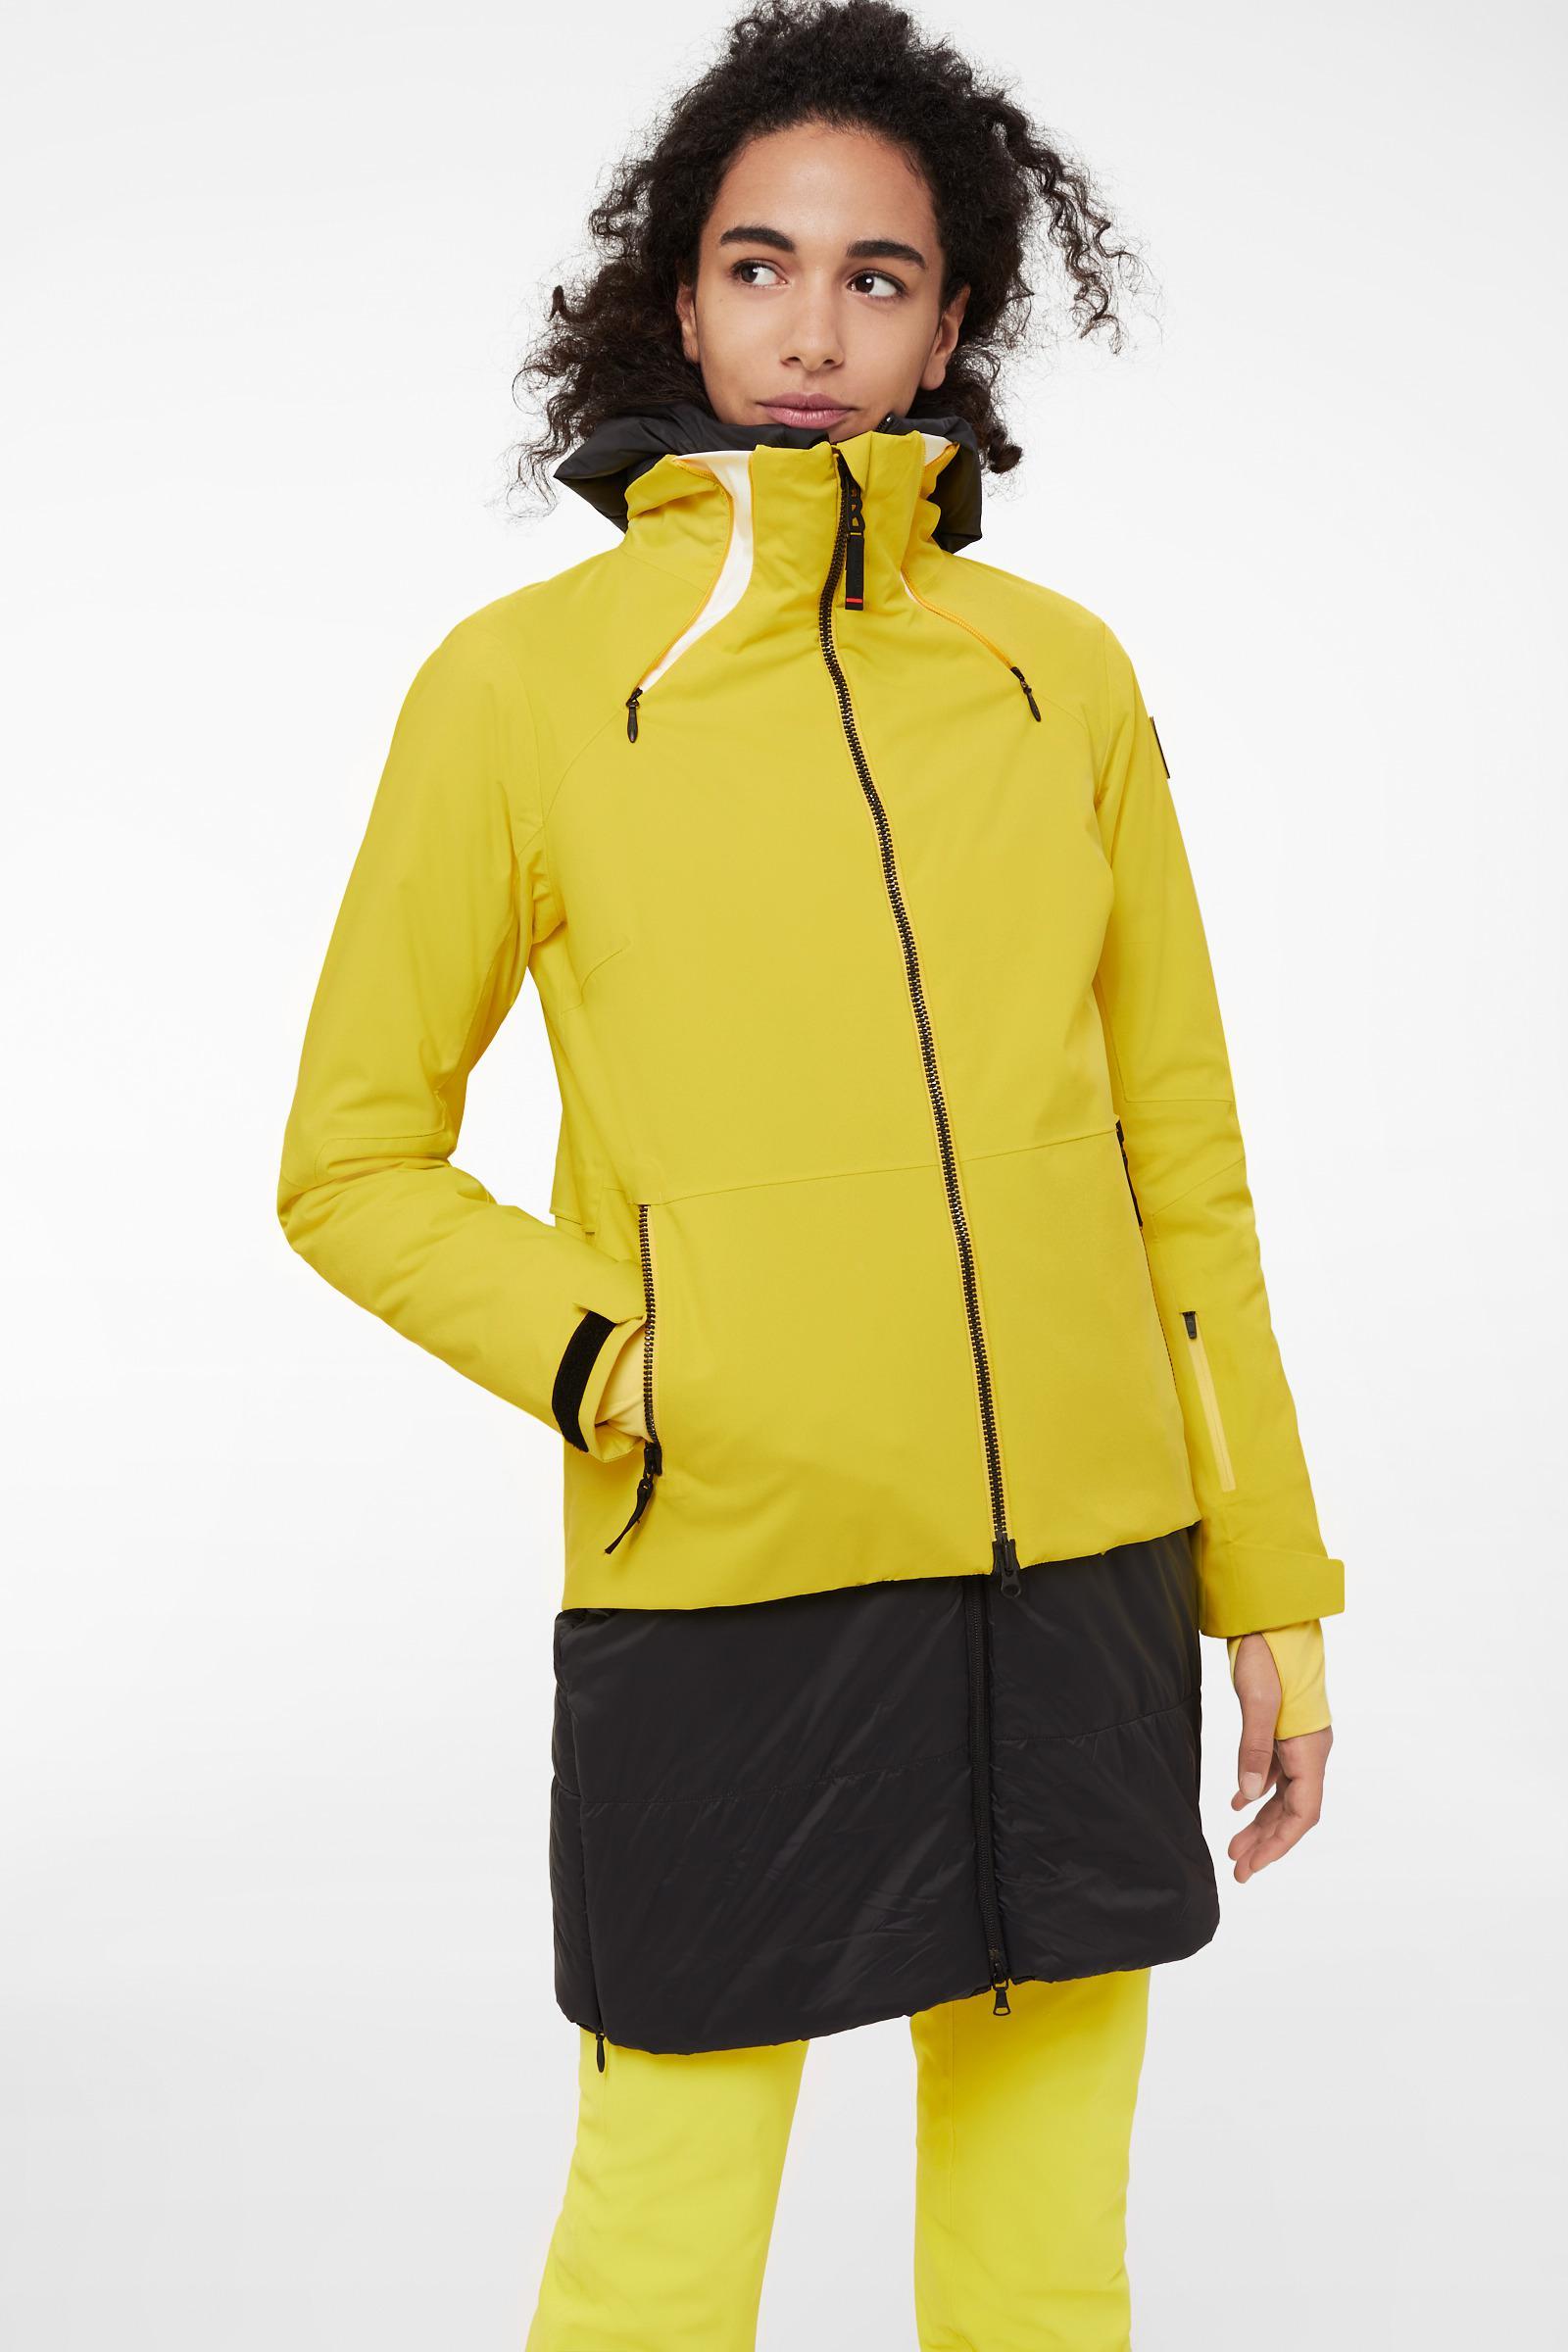 Bogner Danja Ski Jacket In Yellow in Yellow - Lyst 29454e75c